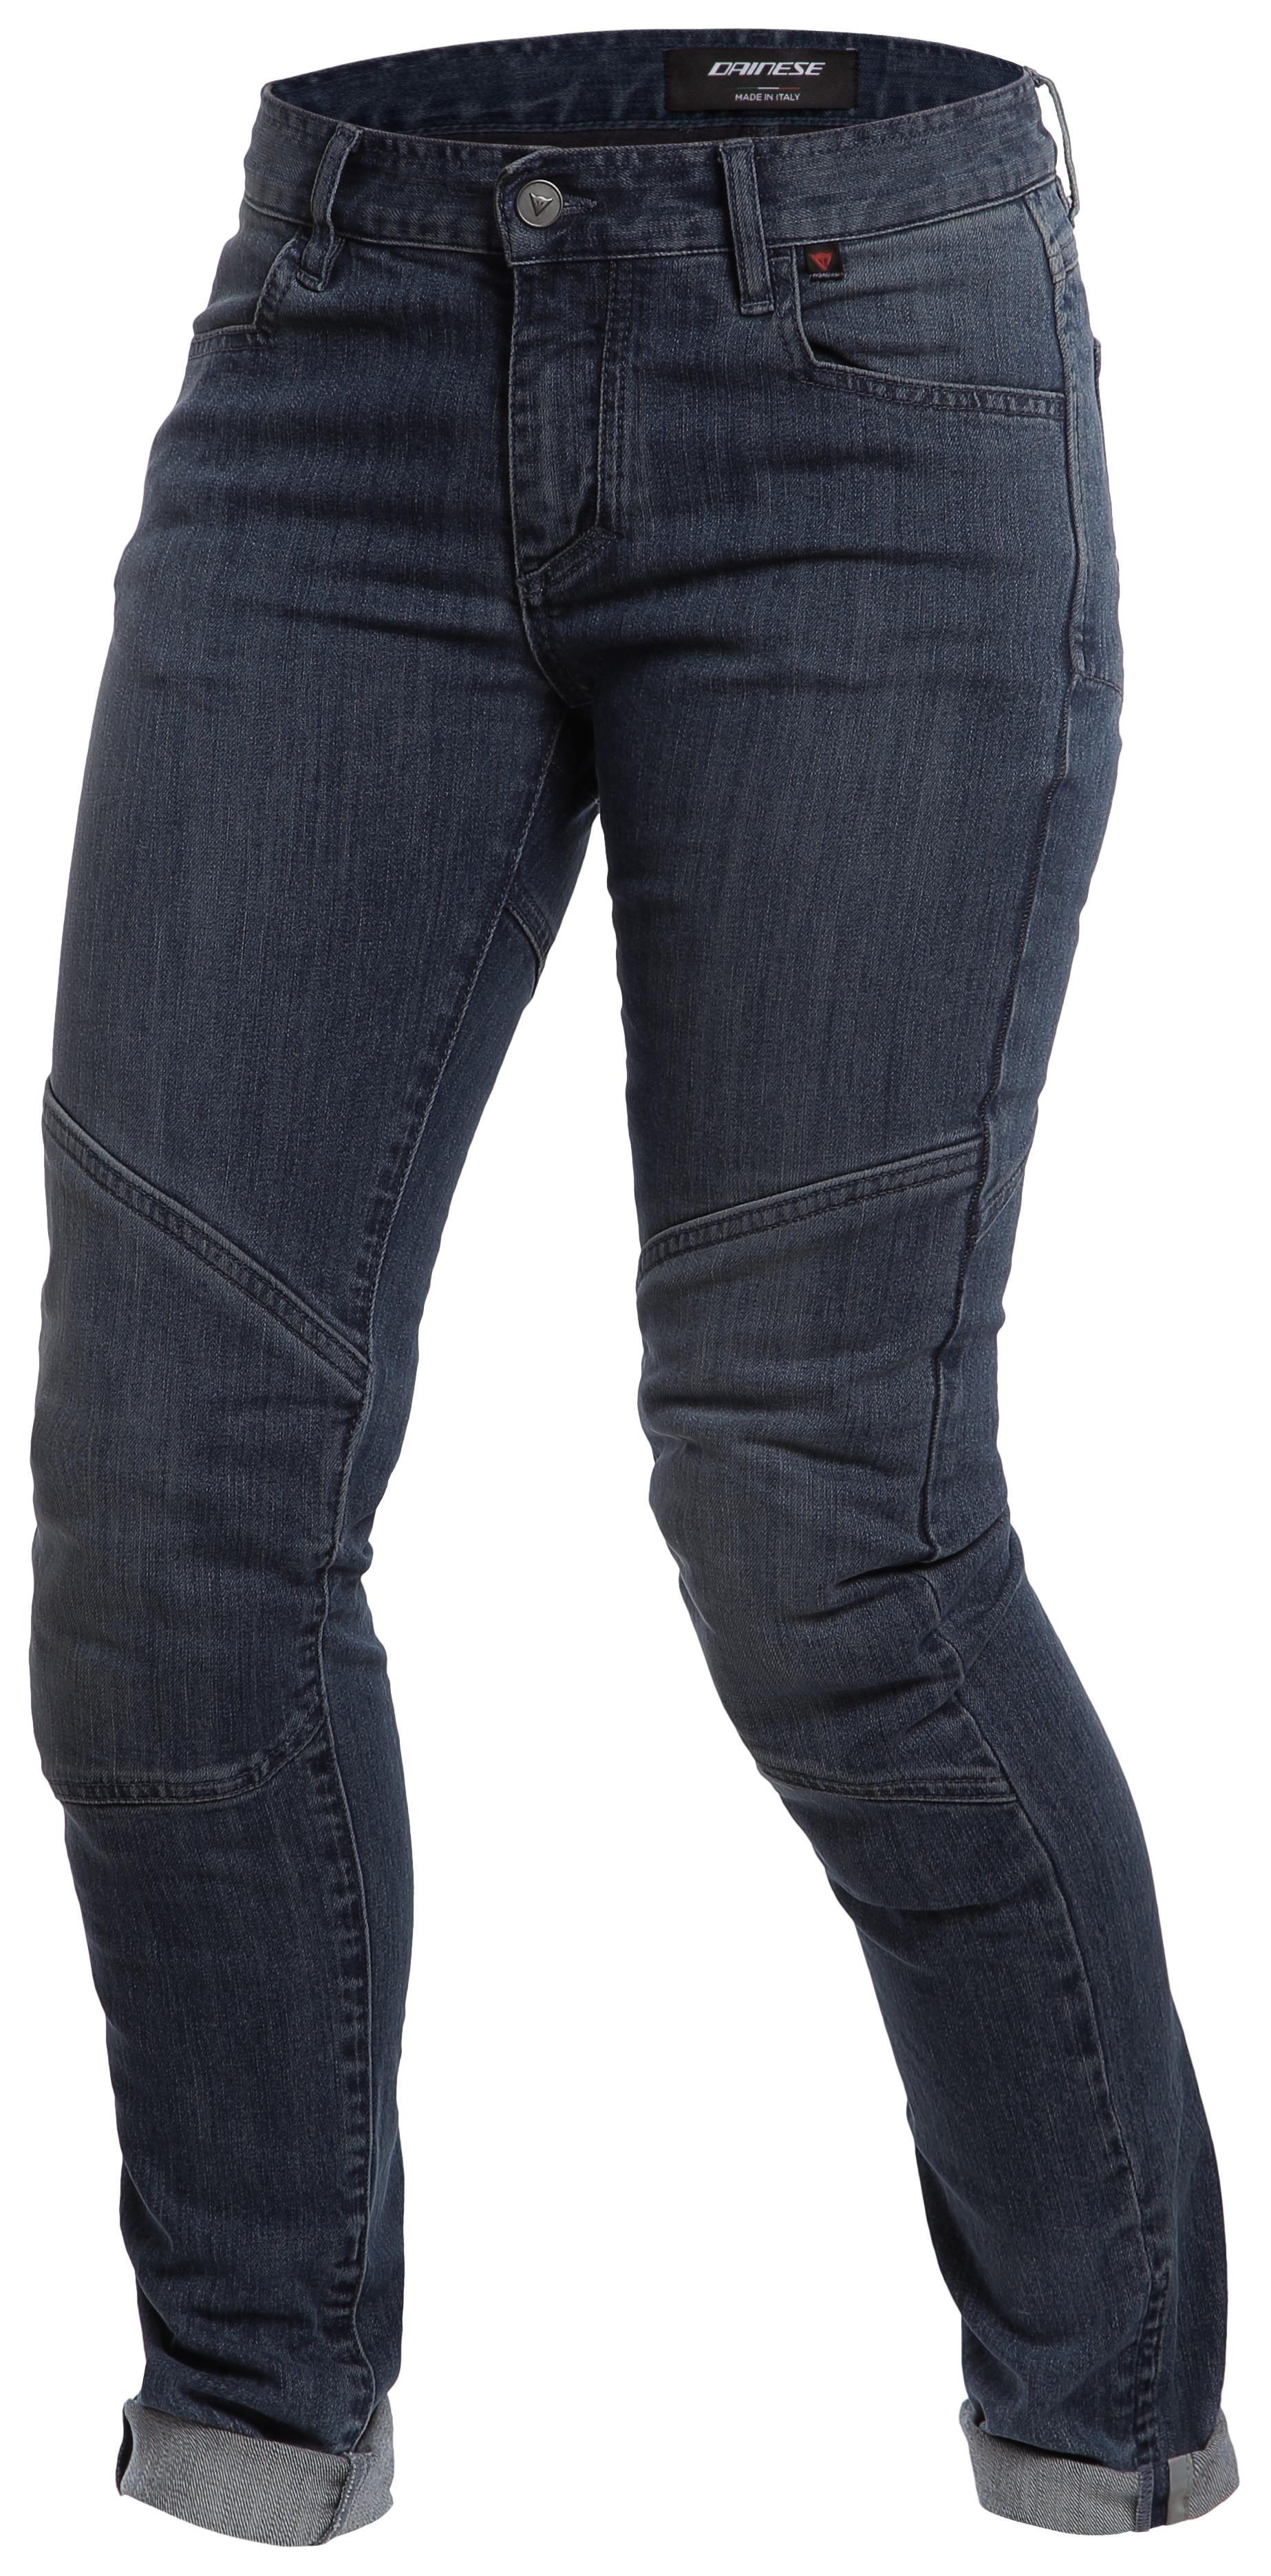 Women's Amelia Dainese Dainese Slim Jeans gf67by